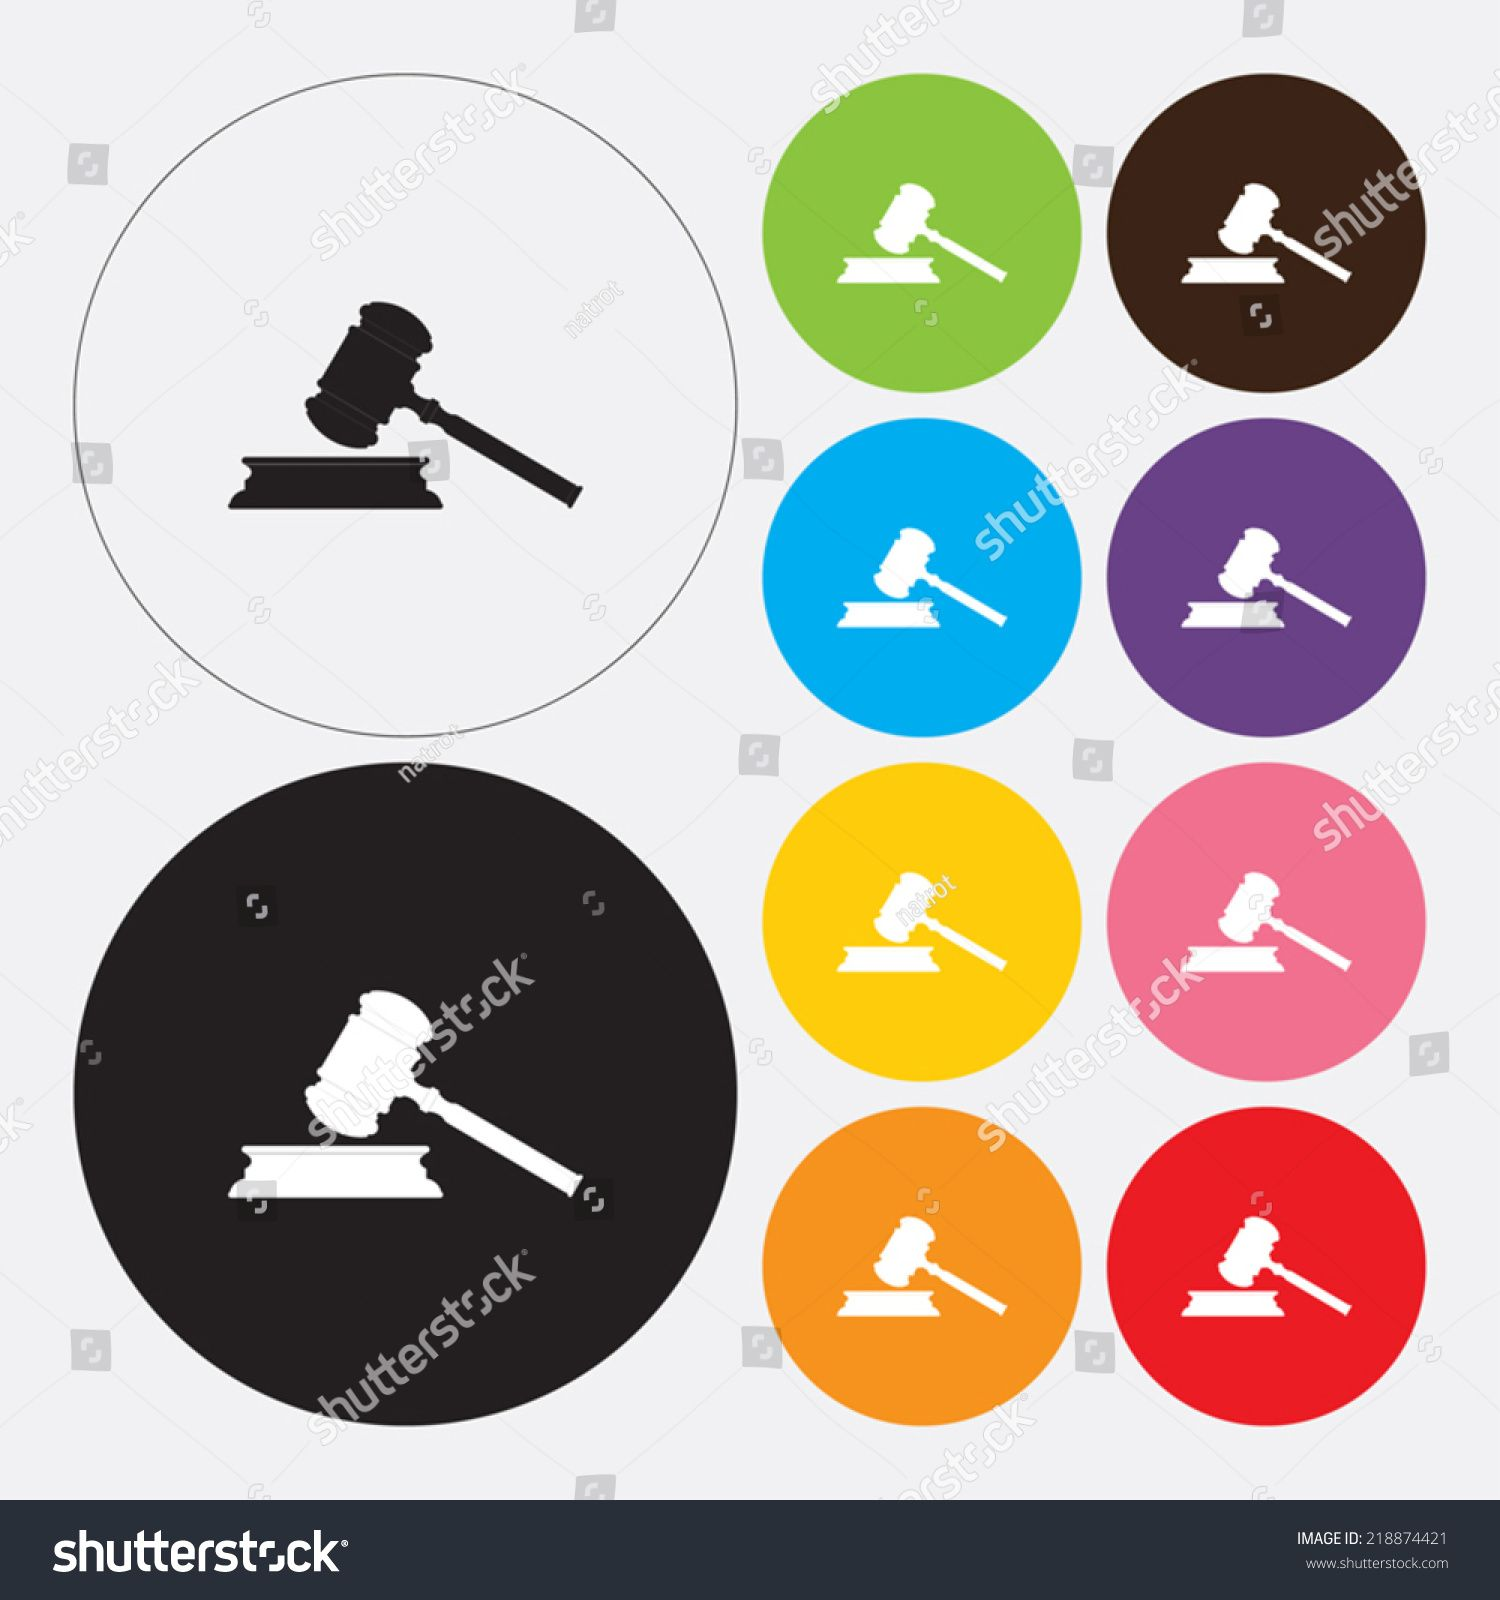 Gavel icon - Vector #Ad , #AFFILIATE, #Gavel#icon#Vector